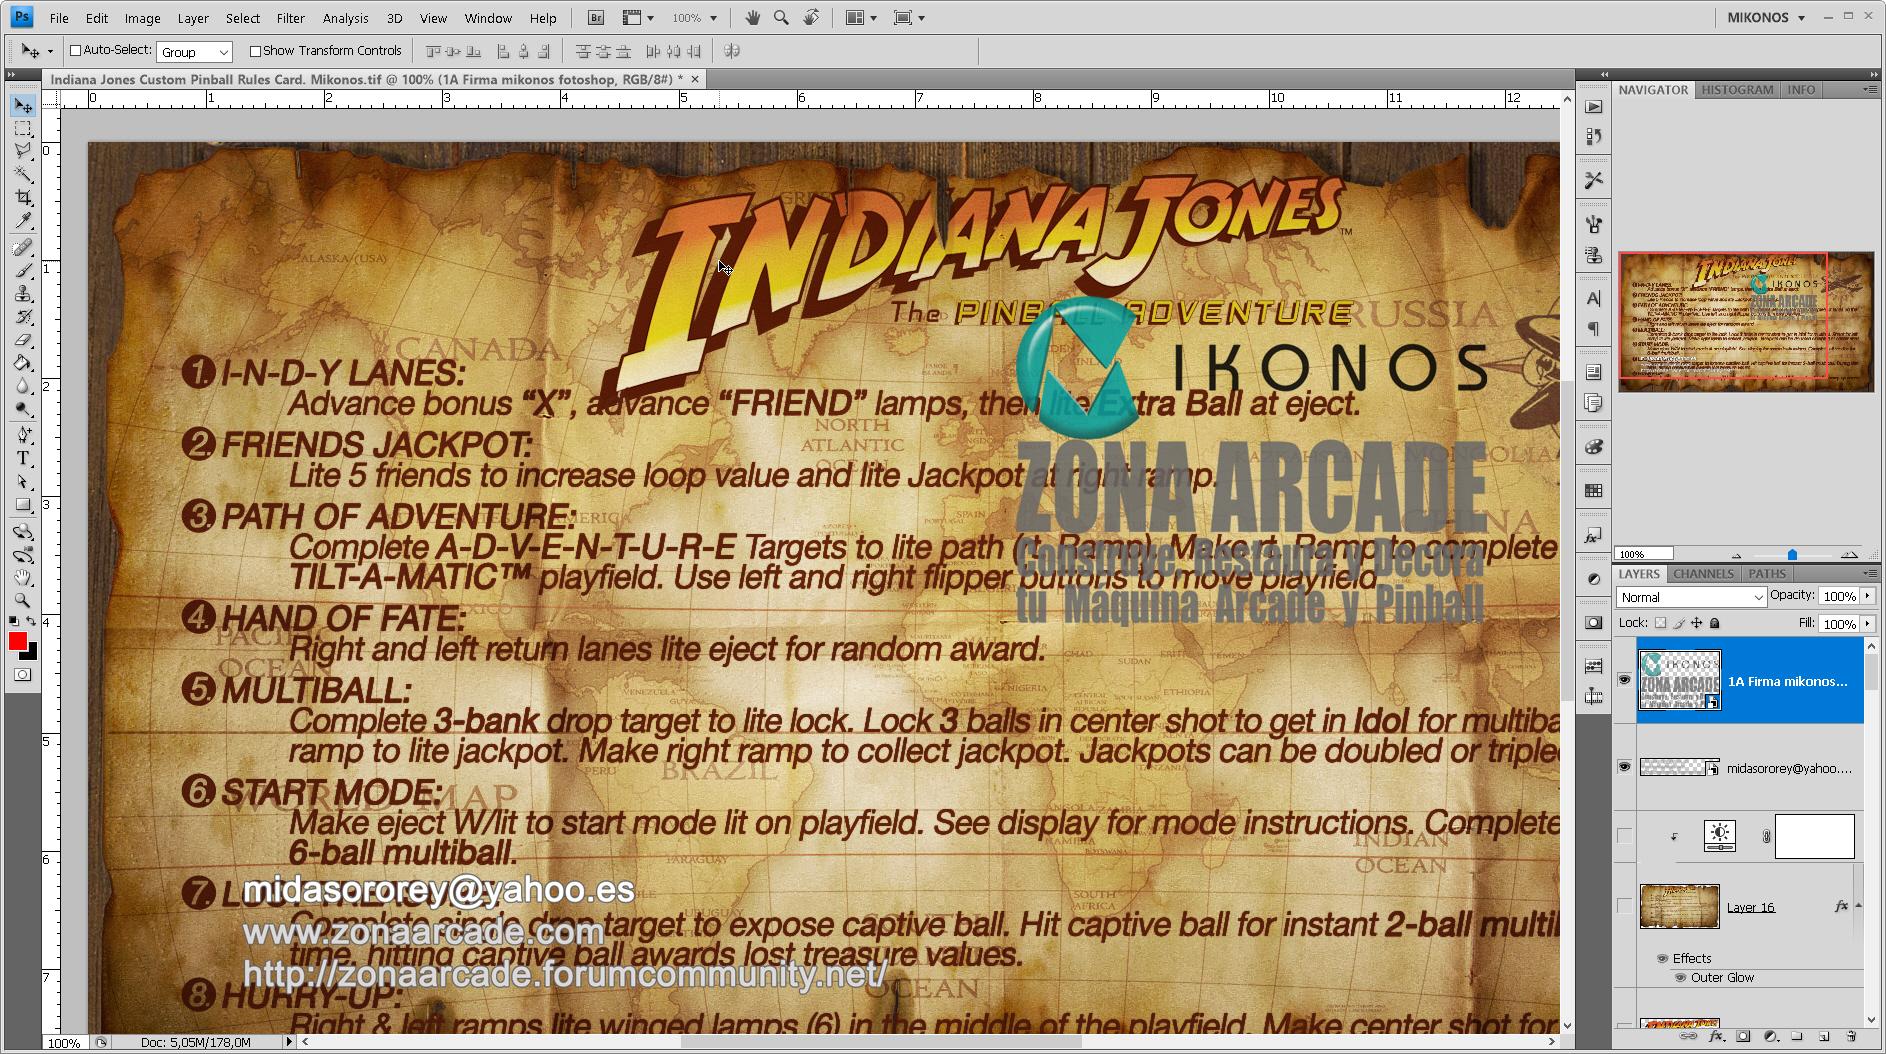 Indiana-Jones-Custom-Pinball-Card-Rules-Mikonos2